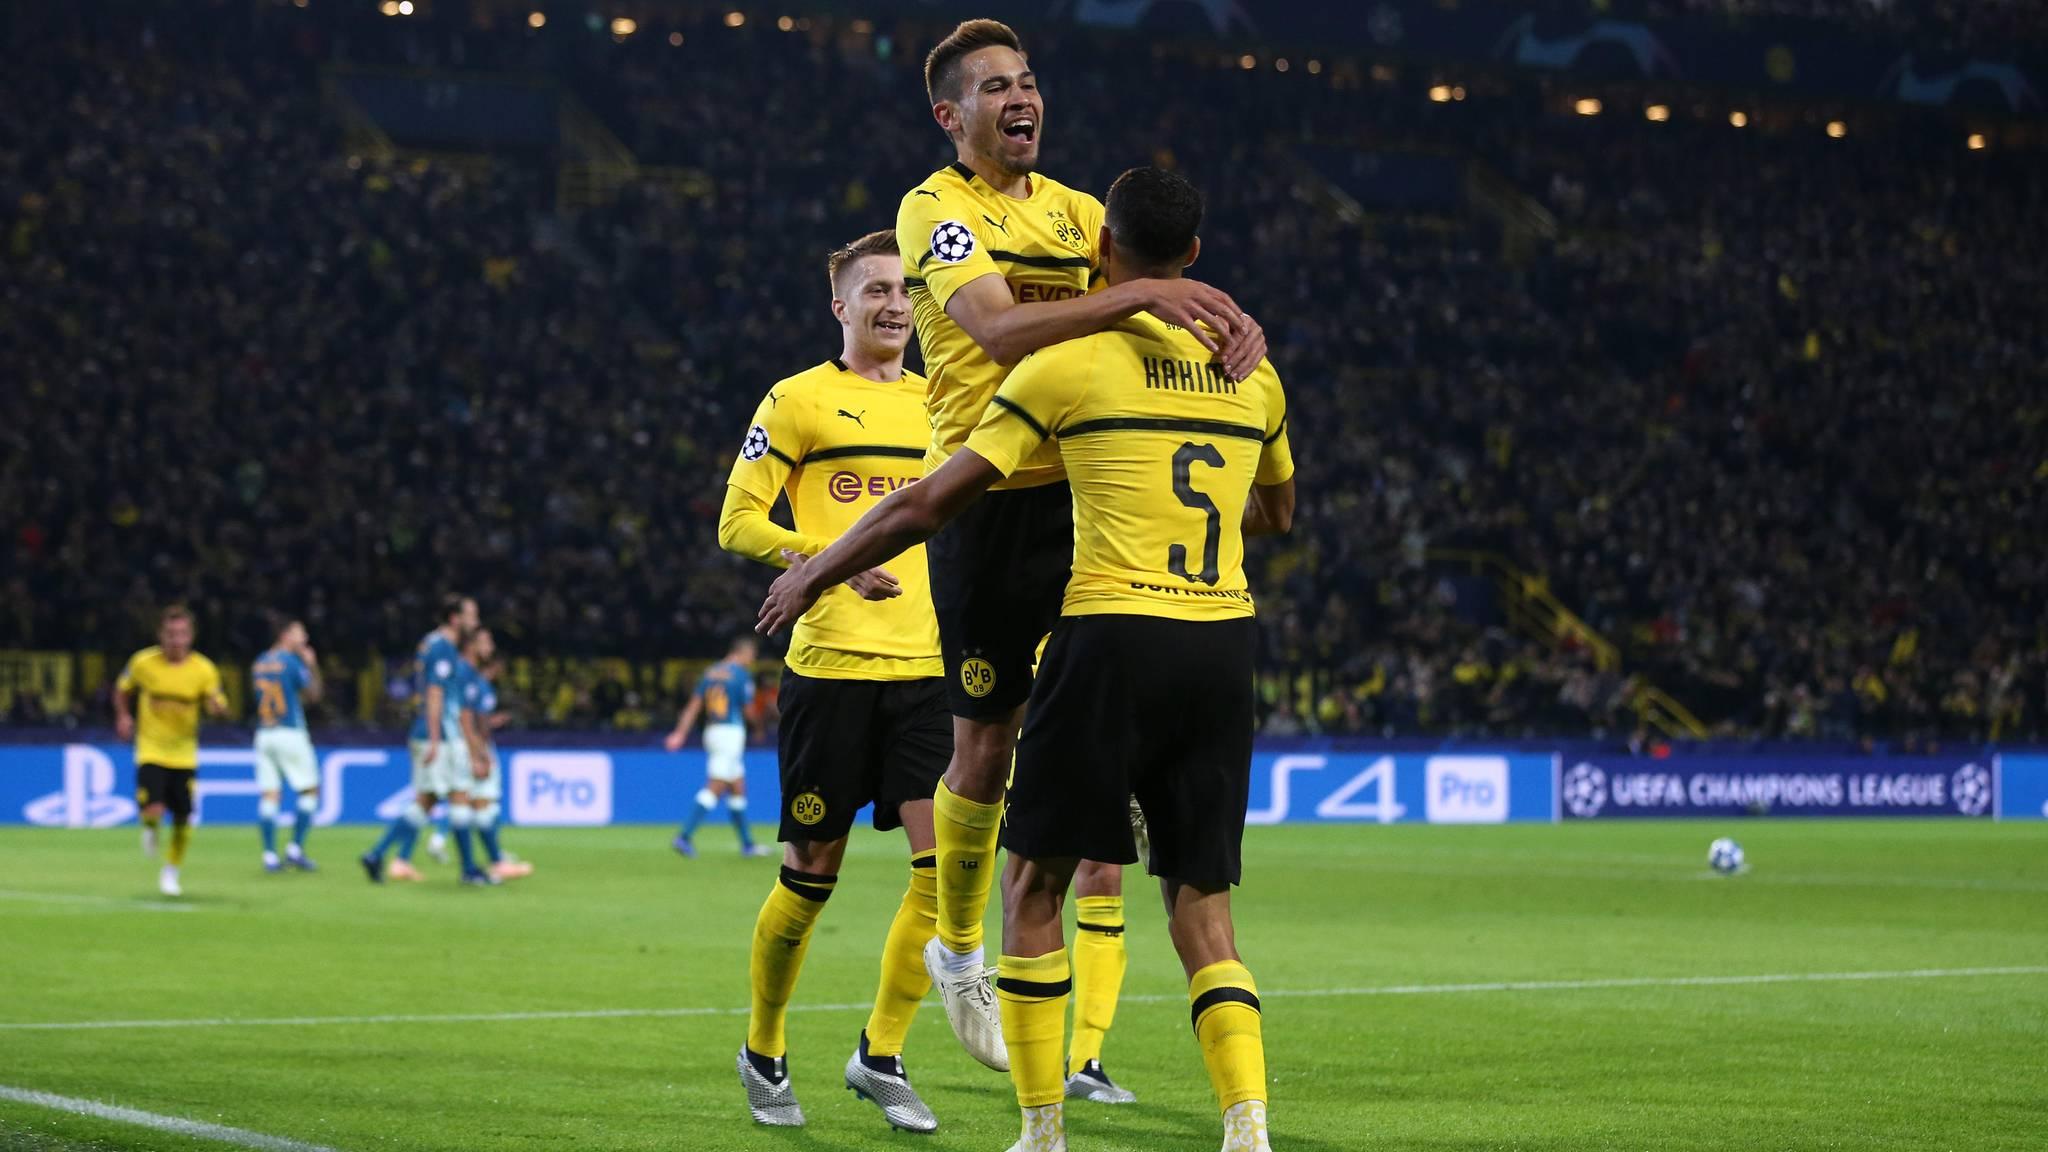 Champions League: Dortmund düpiert Madrid Schalke stark in